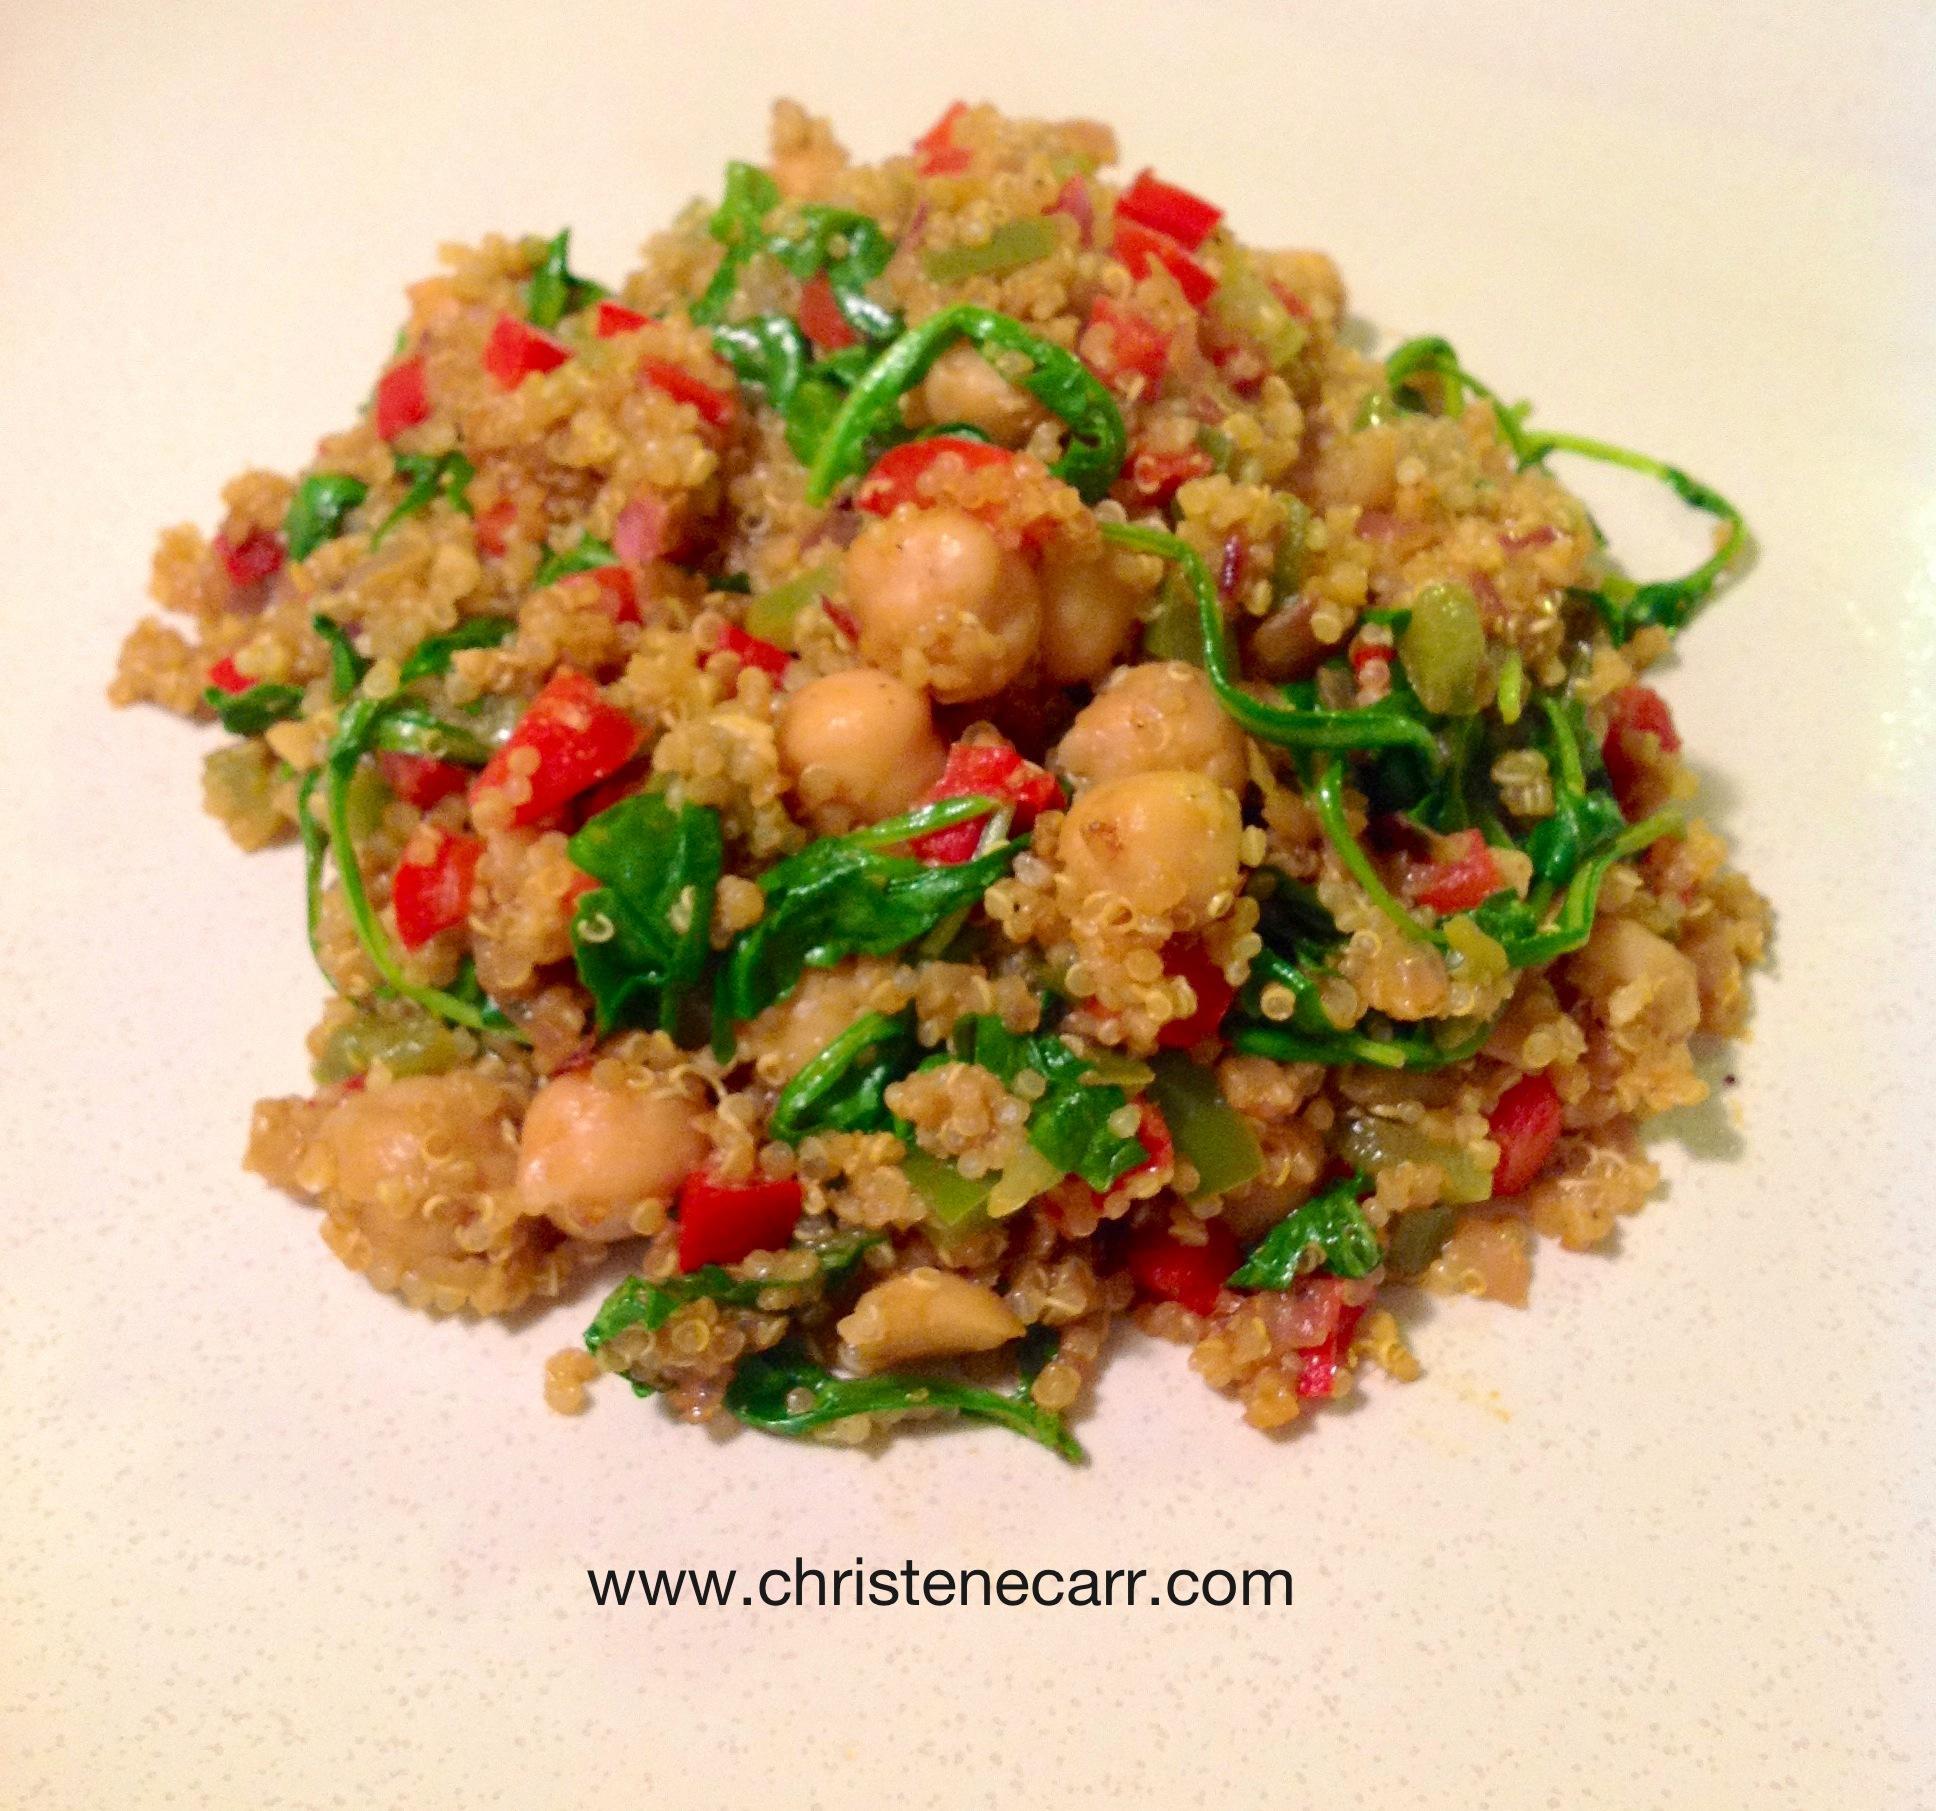 Spicy-Coconut-Curried-Quinoa.jpg